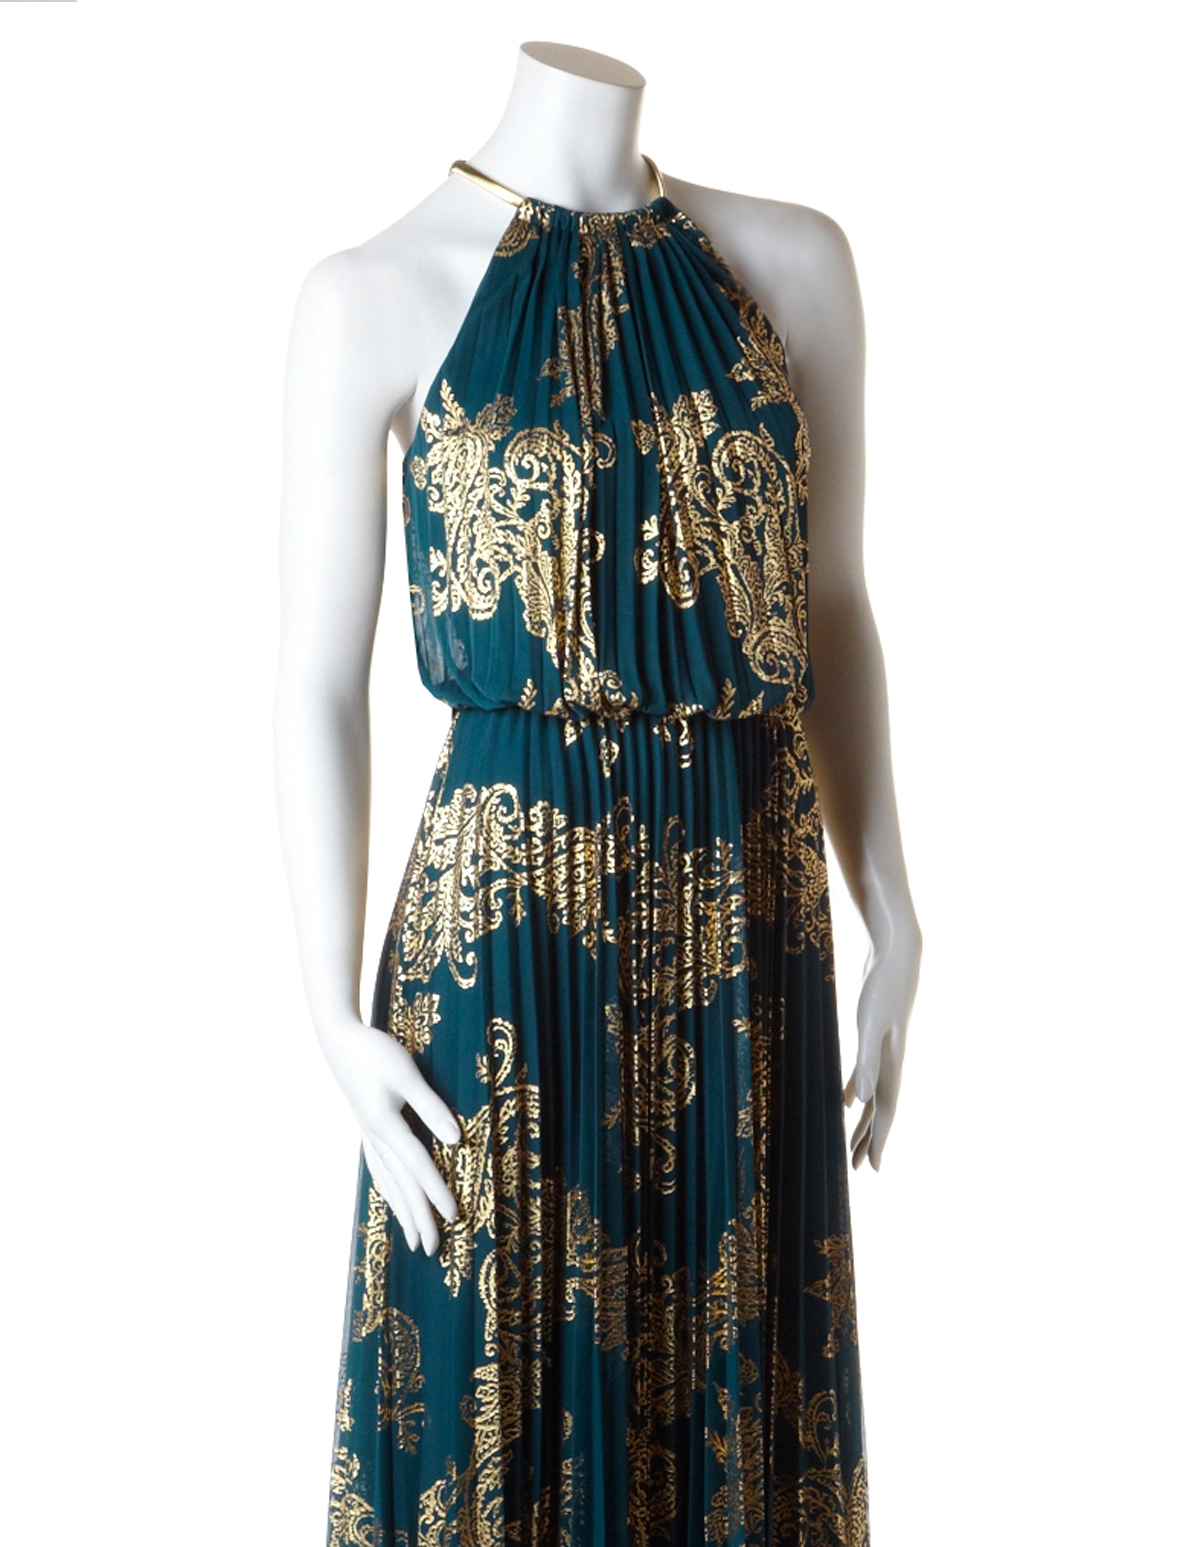 Green halter maxi dress